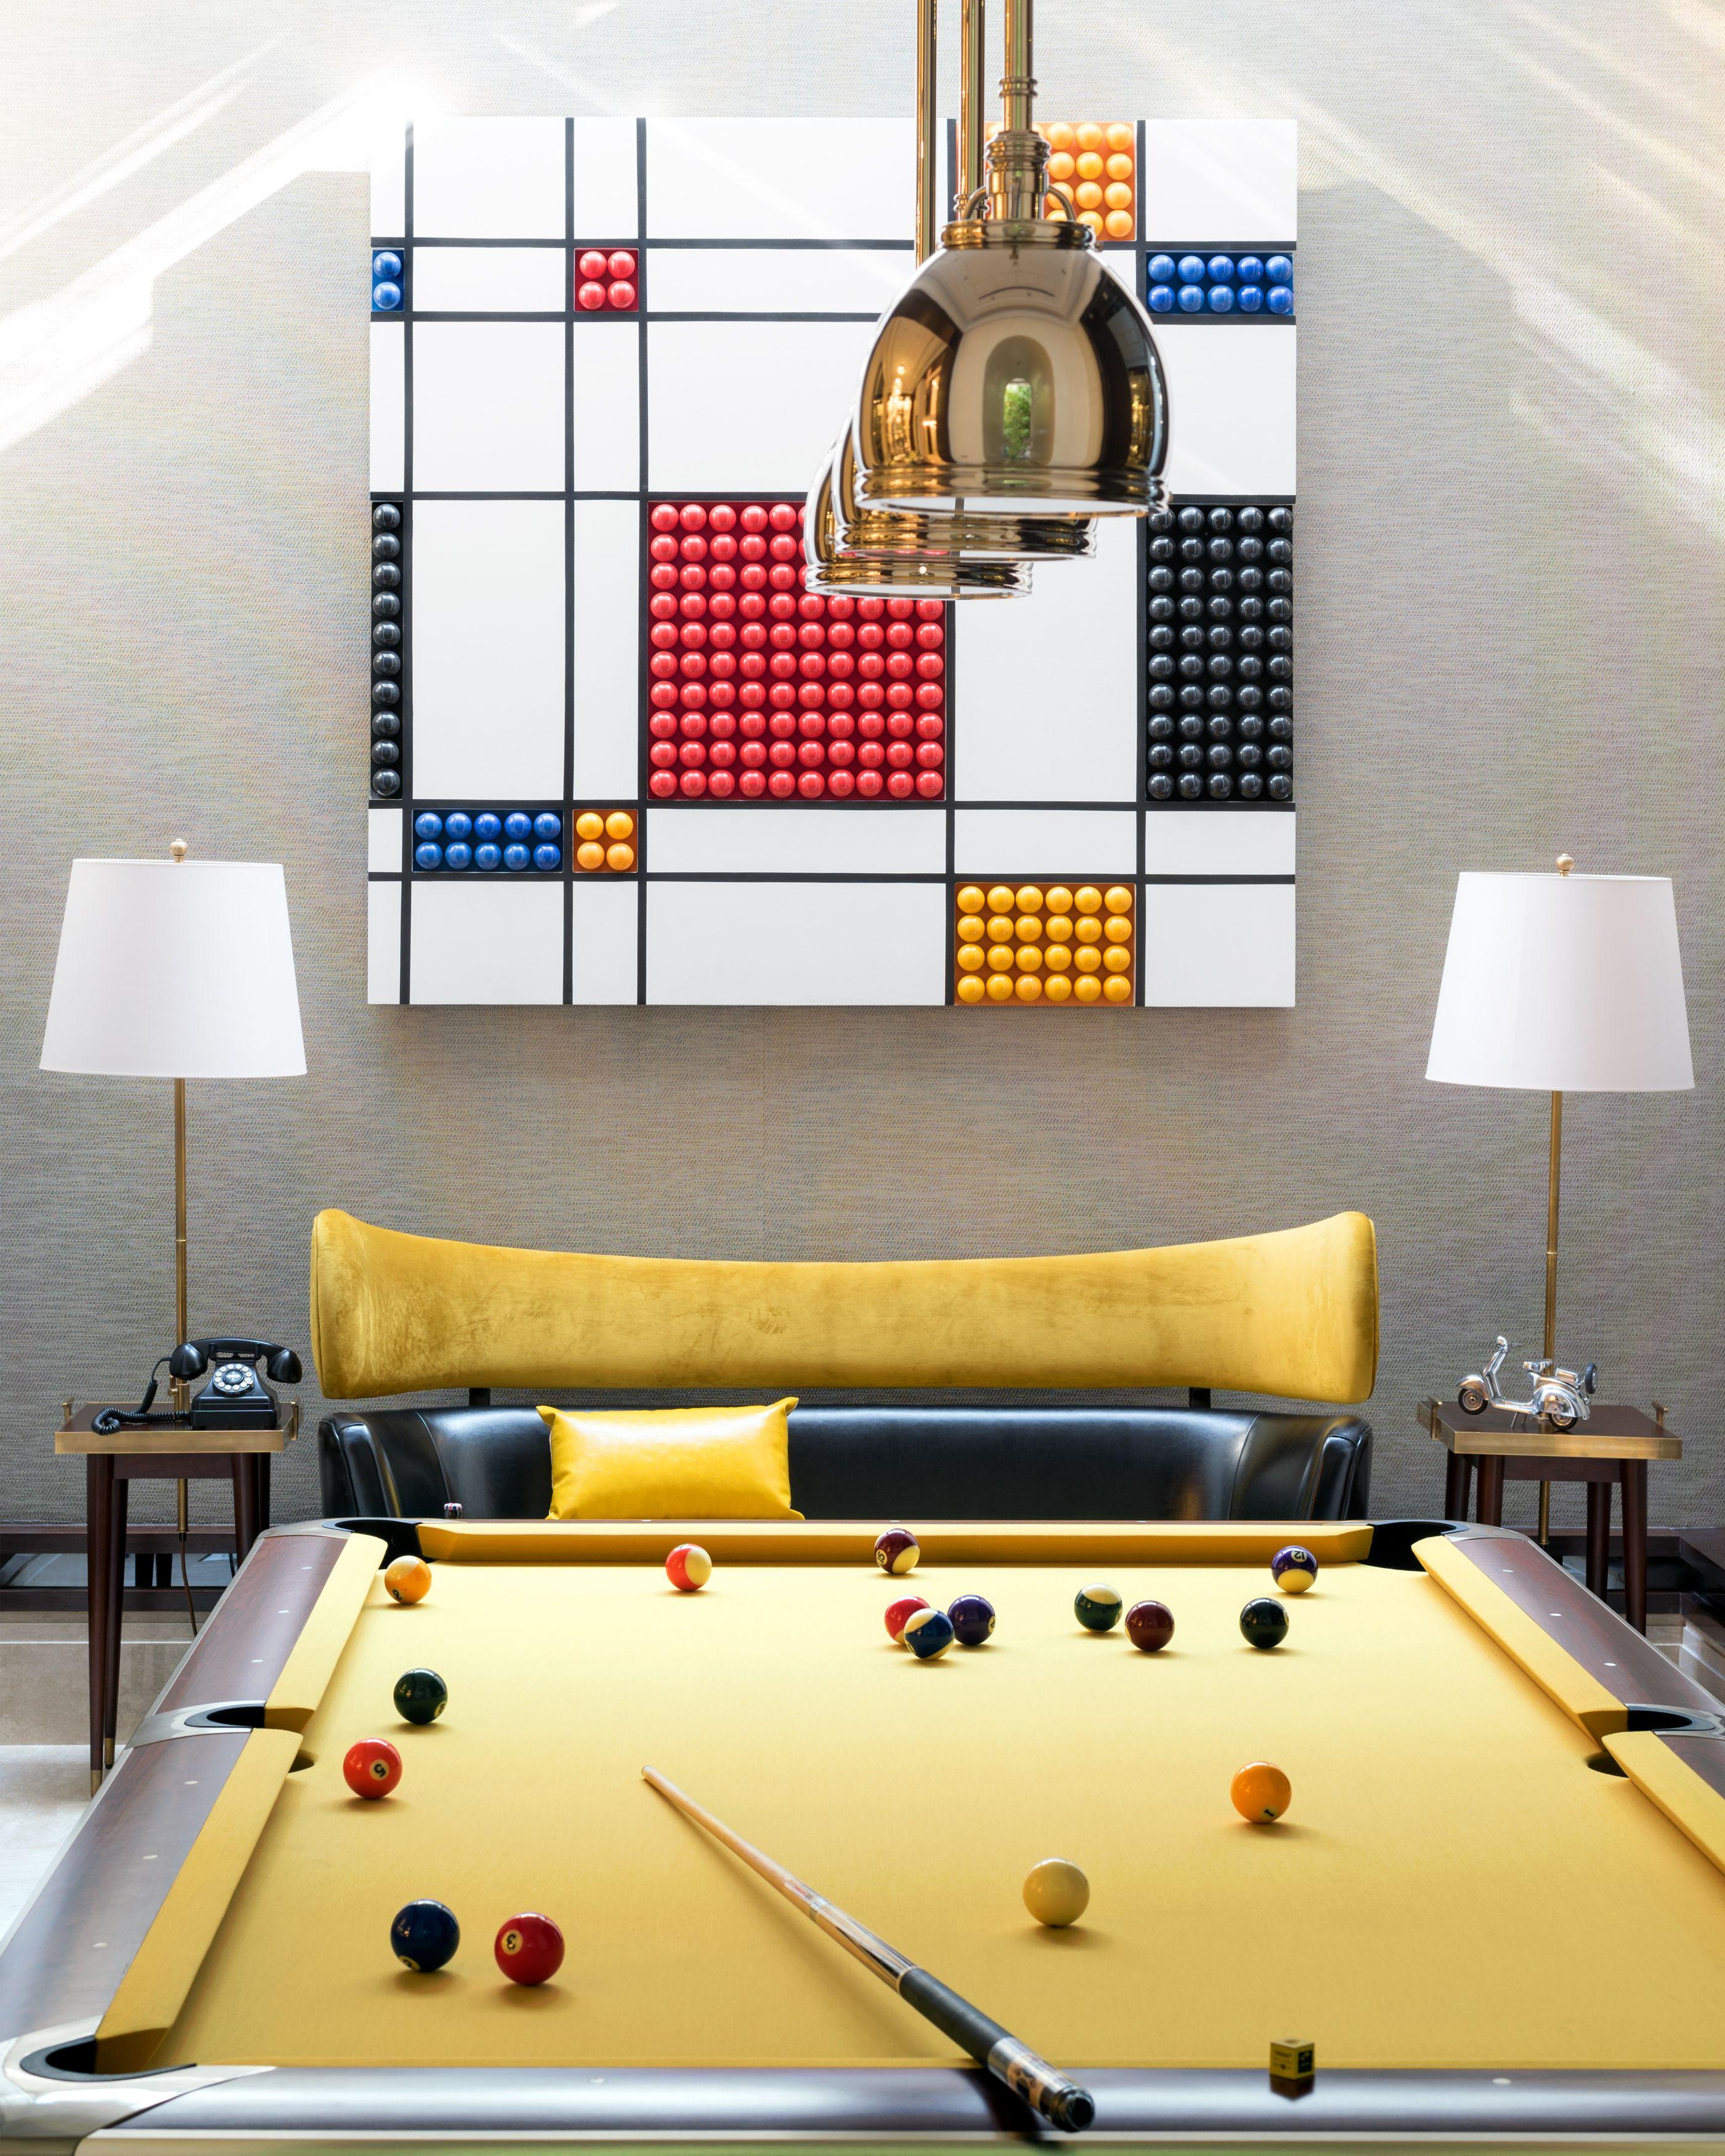 In The Basement / BIlliards Room / Postmodernism Interior